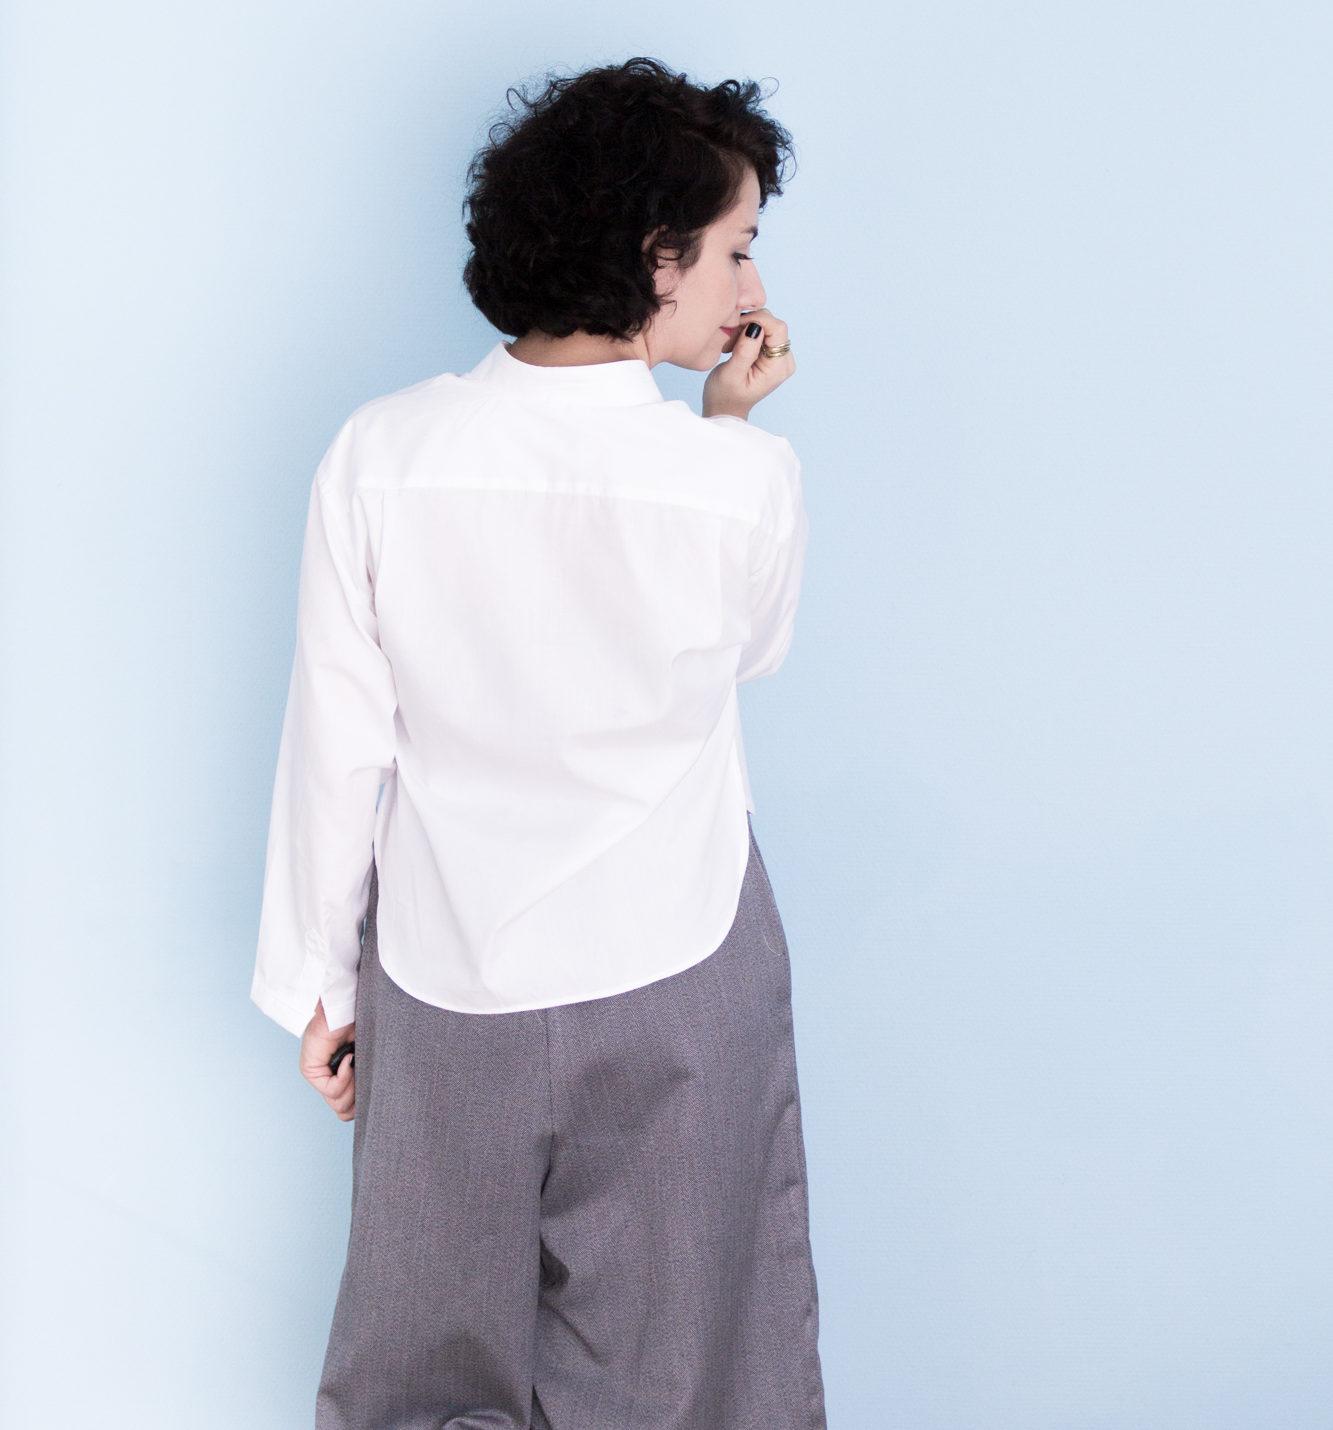 Culottes von Named Clothing - Tweed & Greet